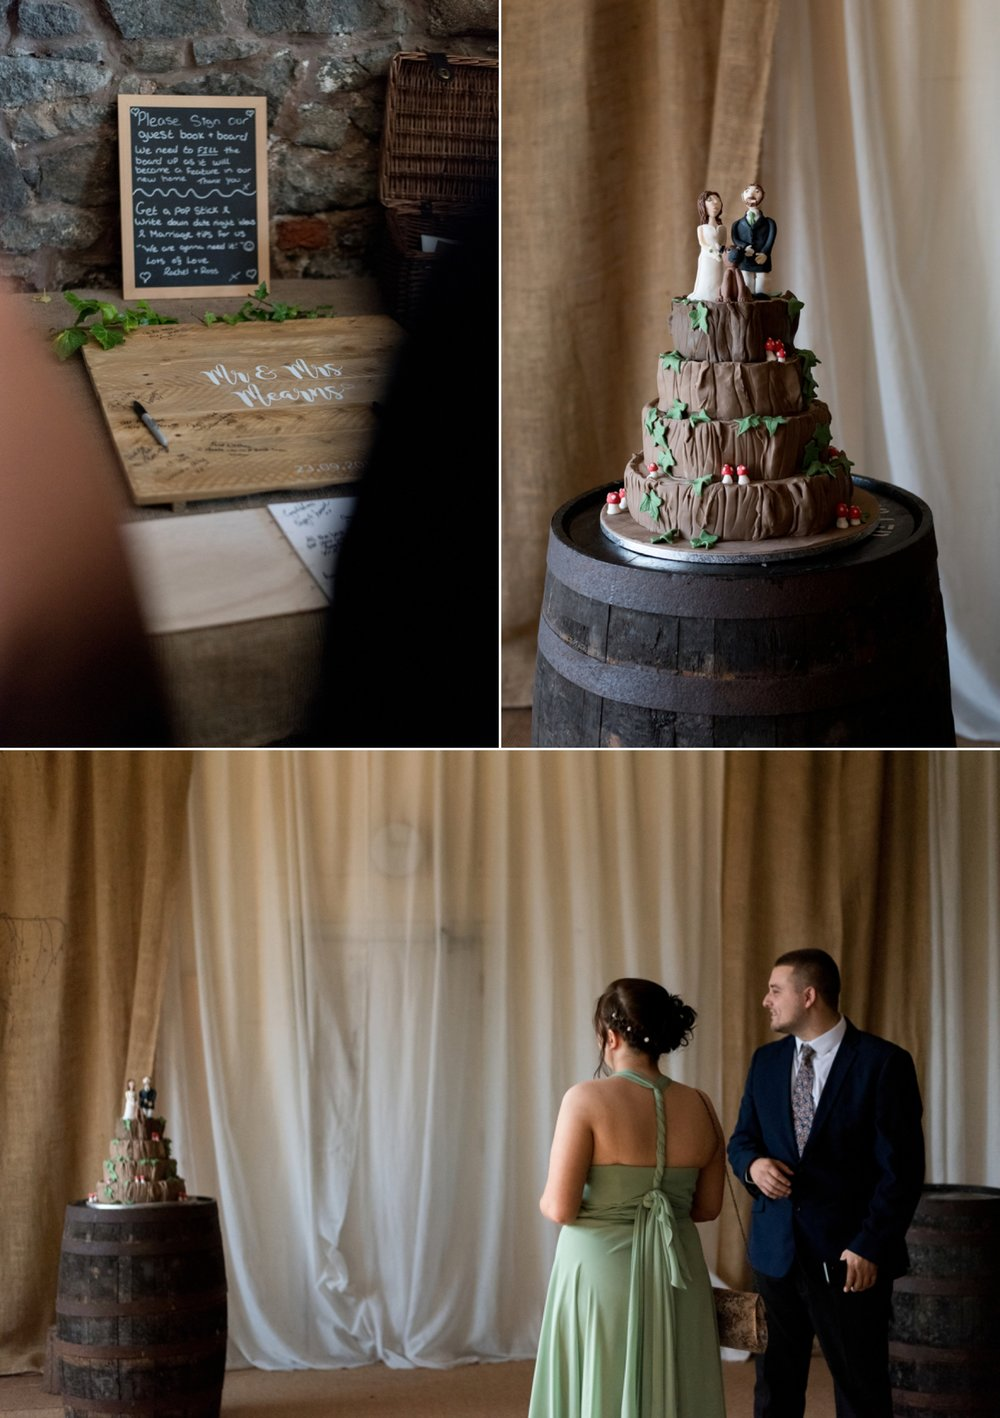 2017-09-23 (Mearns) Pratis Farm Wedding Photography124351.jpg